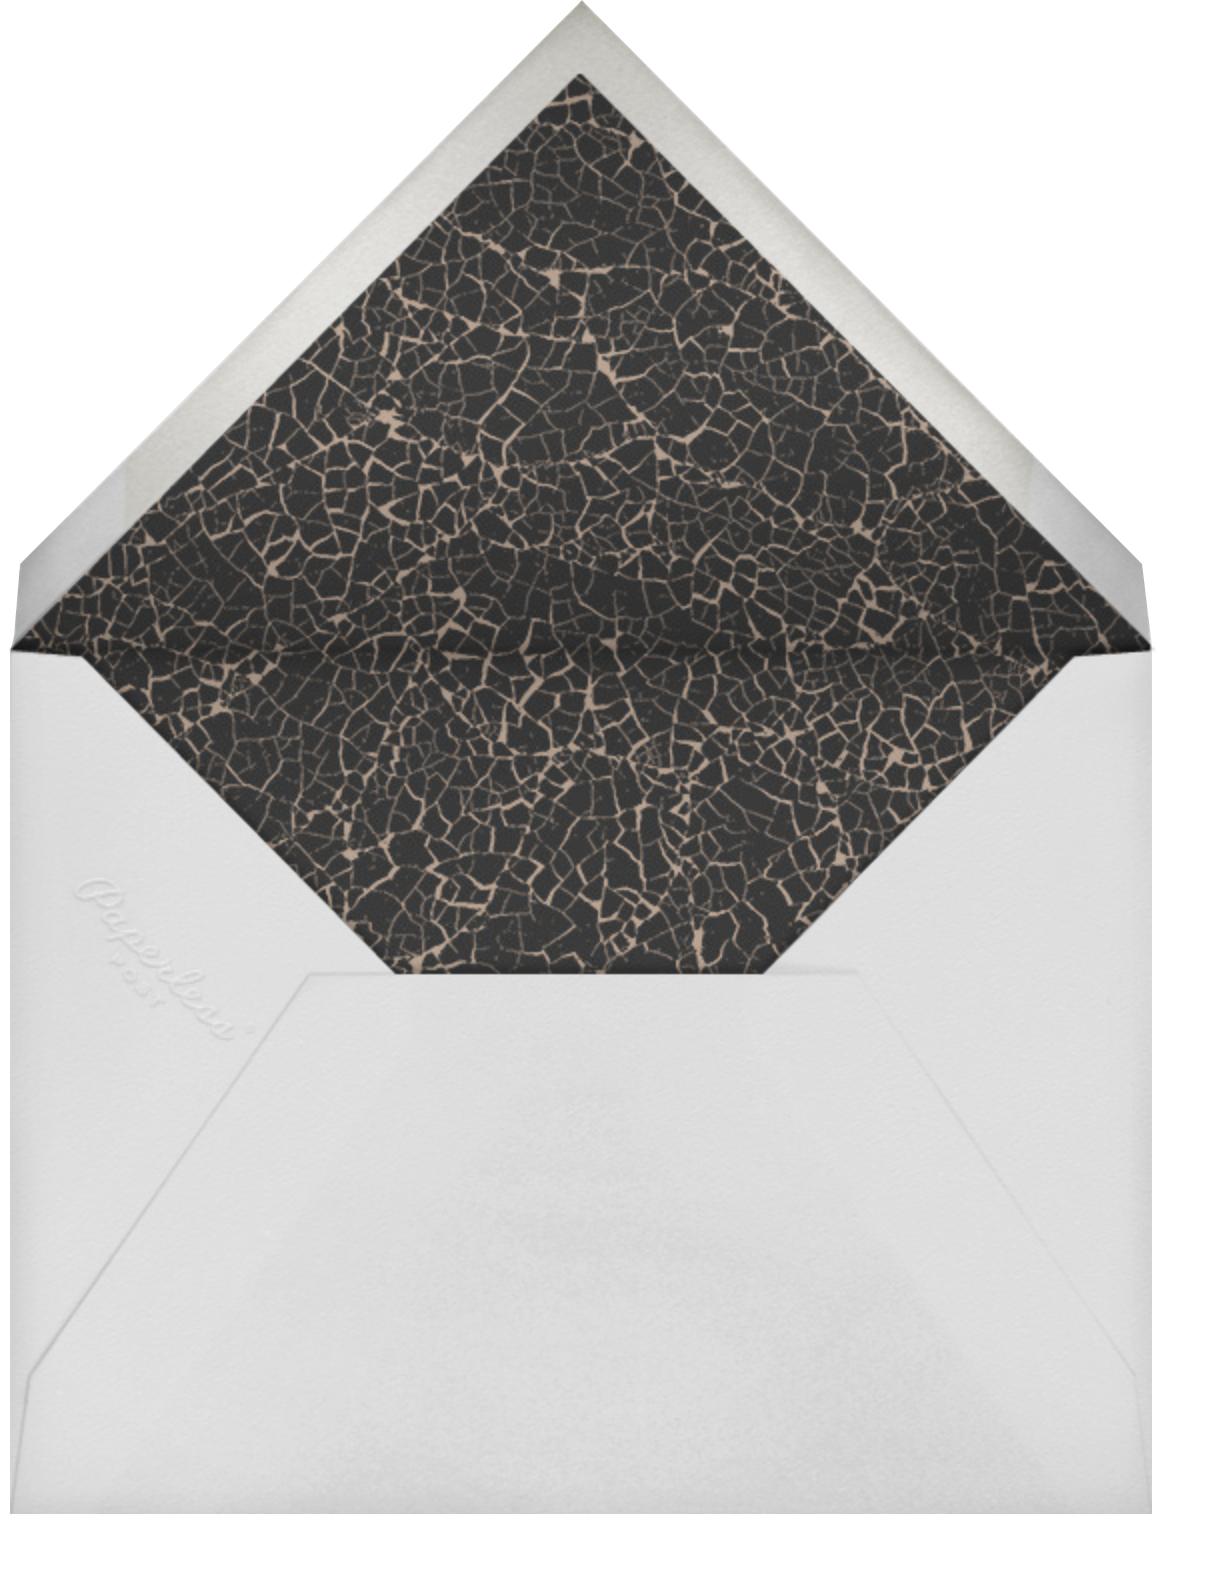 Woodcut - Walnut - Kelly Wearstler - Autumn entertaining - envelope back